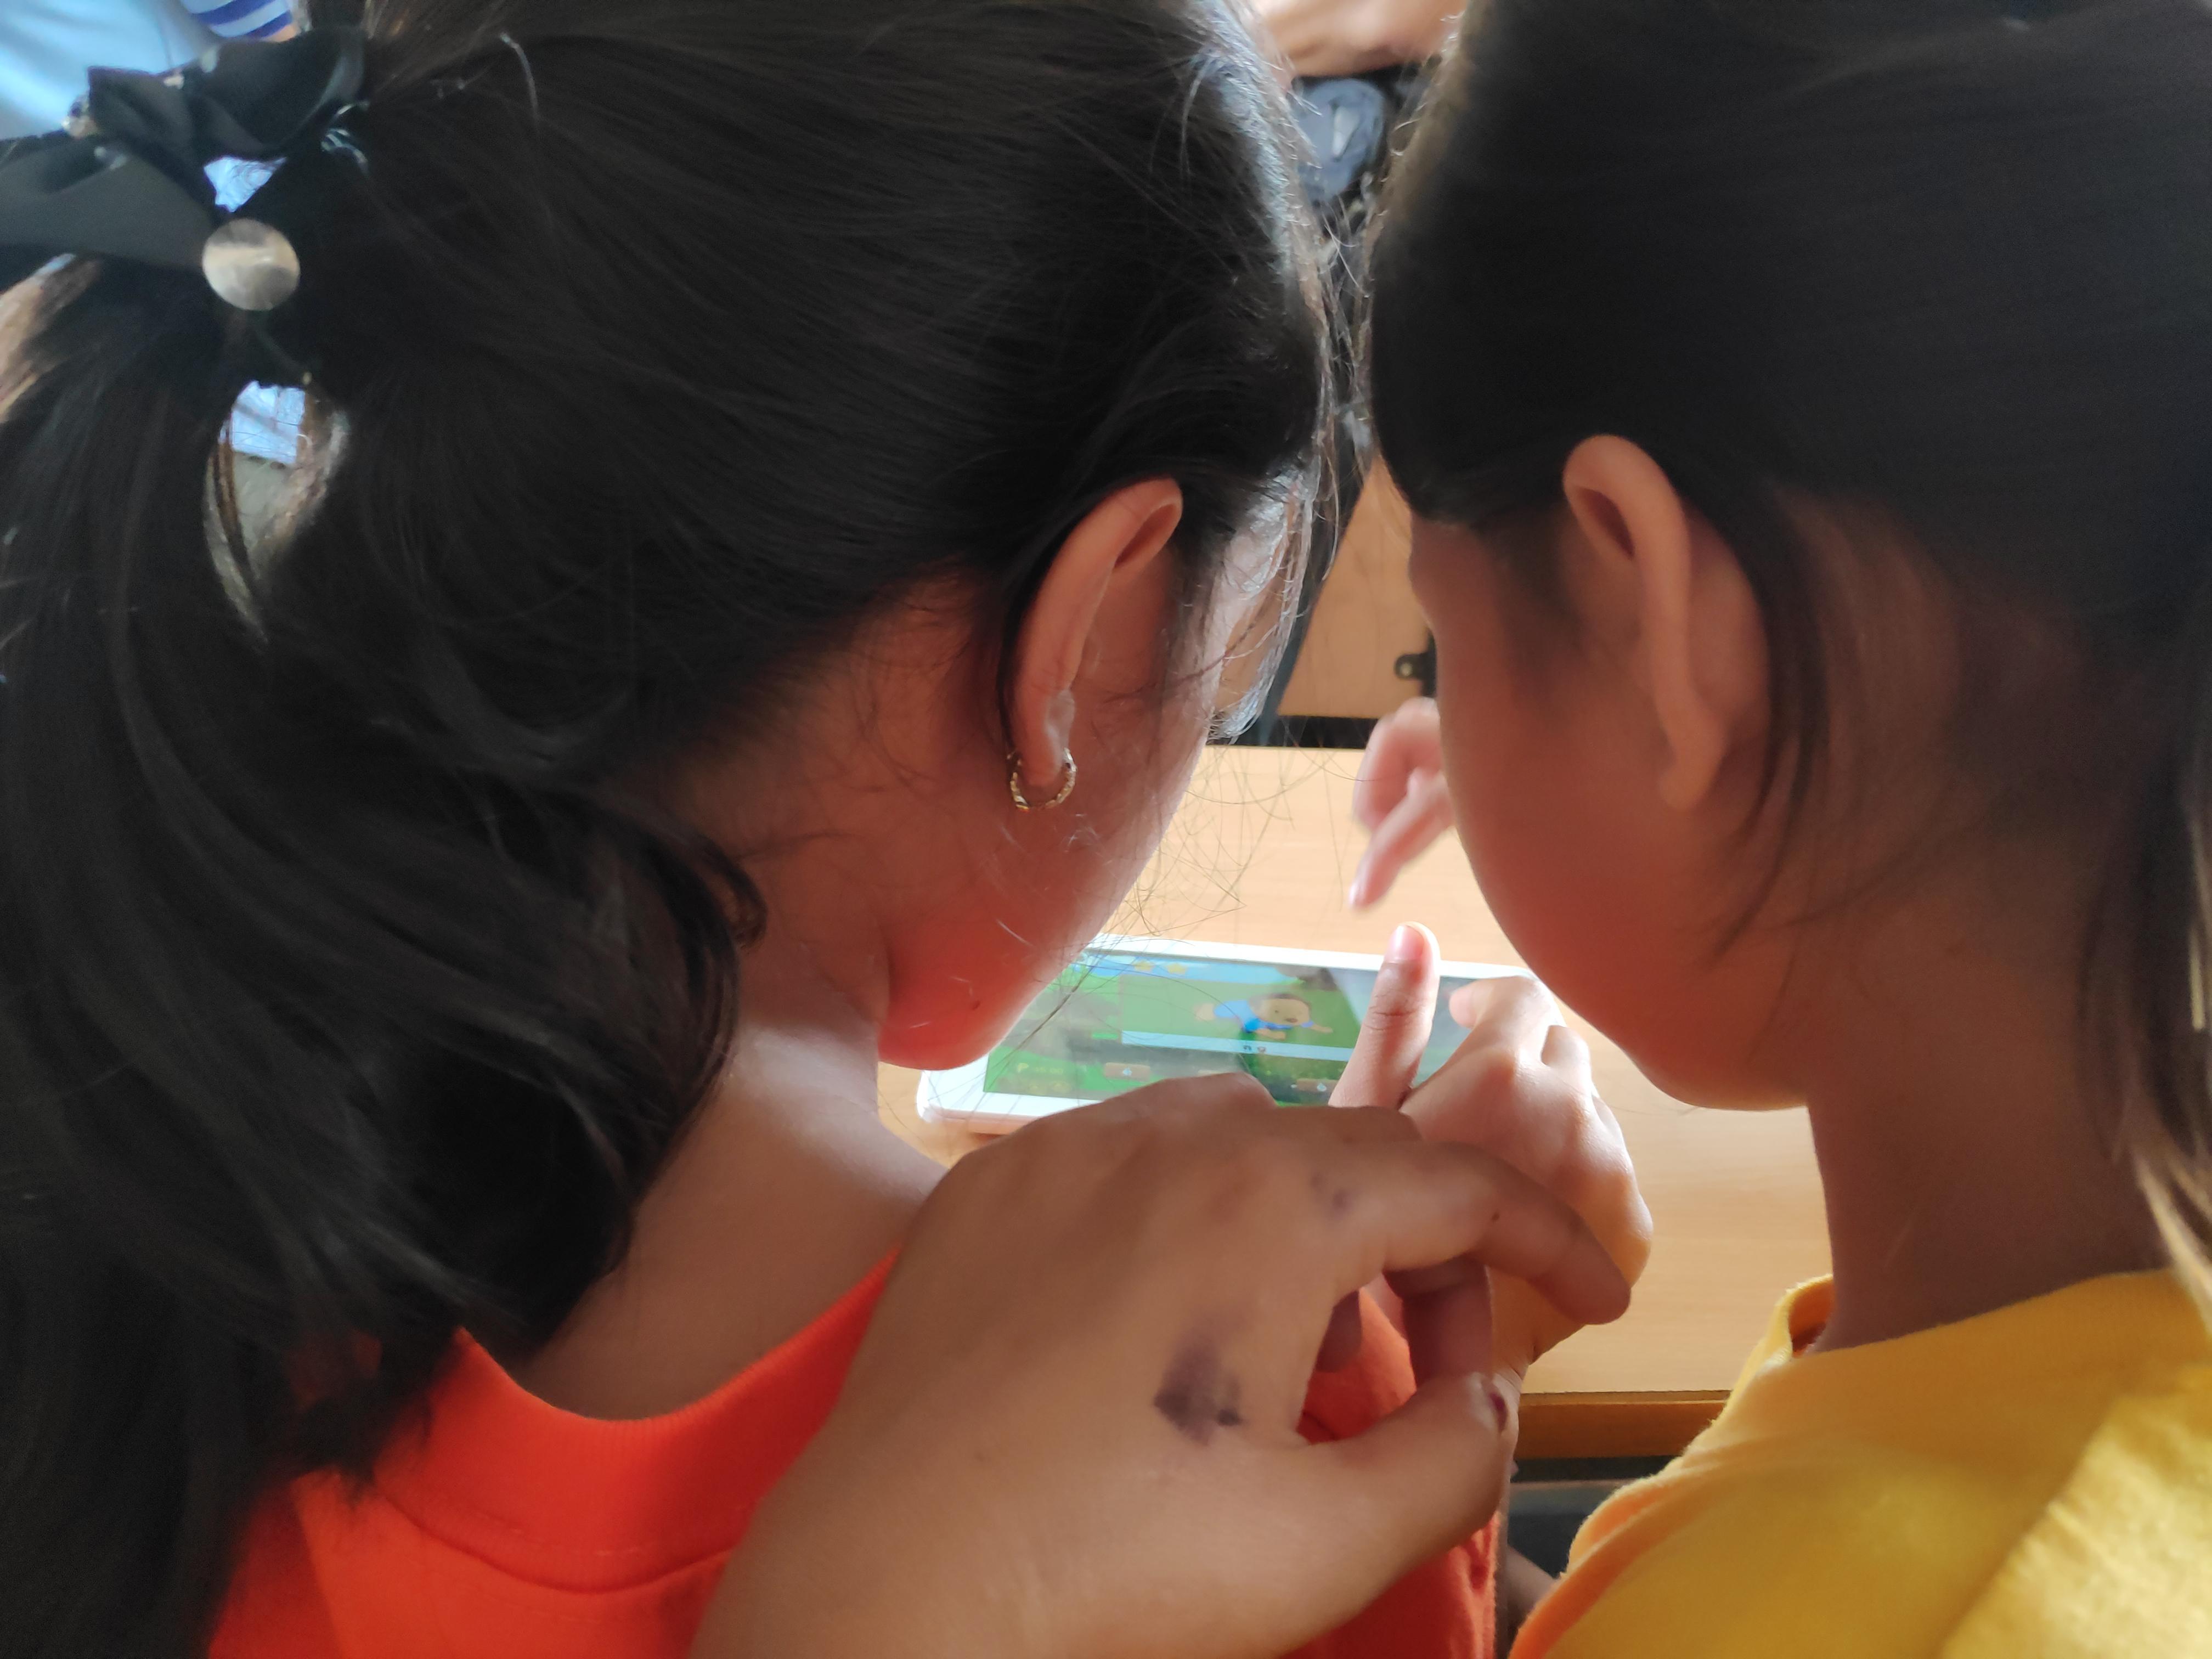 USeP-IC students conduct literacy app field test in Sarangani